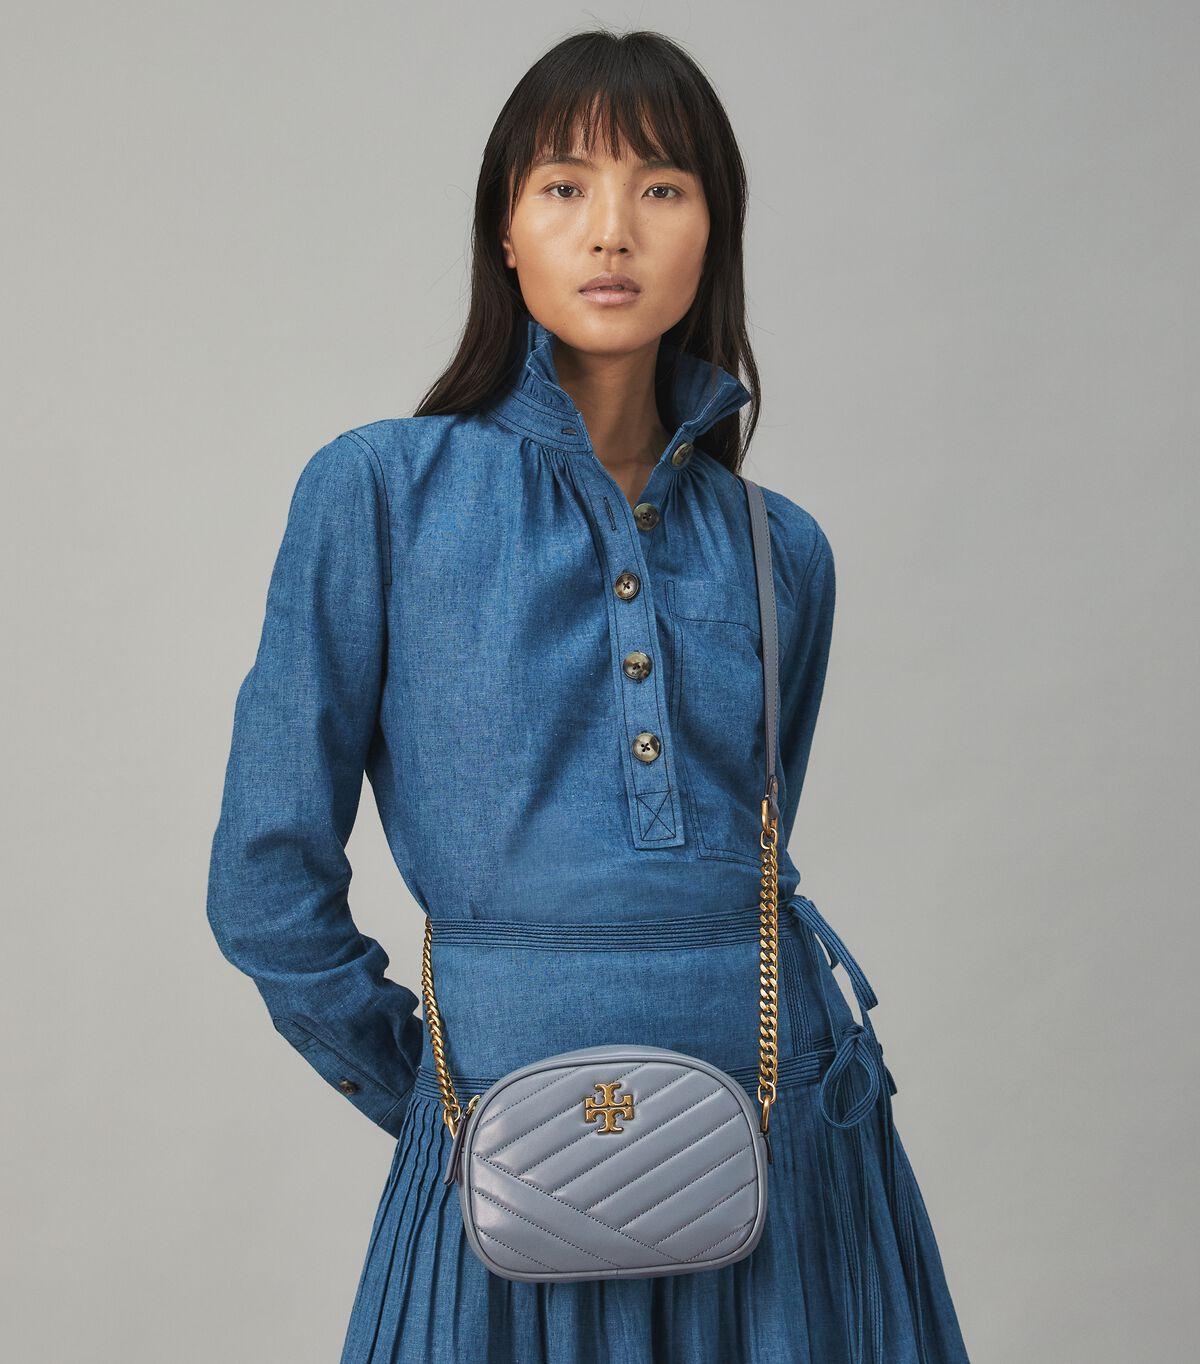 Kira Chevron Small Camera Bag